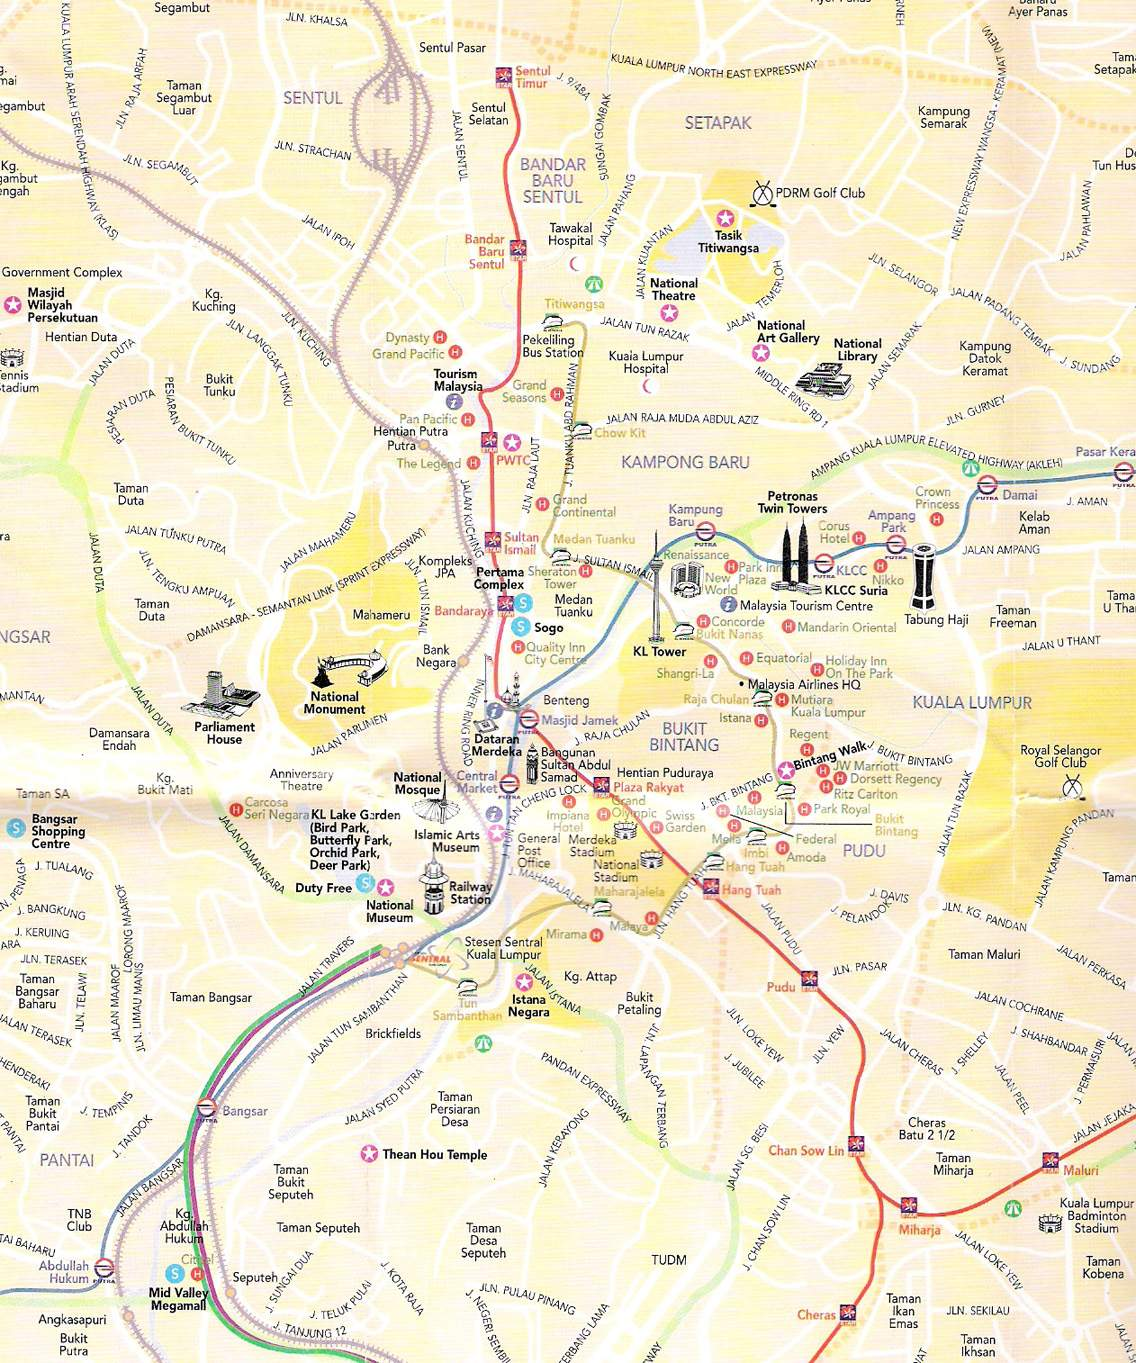 Kuala Lumpur Map Large Kuala Lumpur Maps for Free Download and Print | High